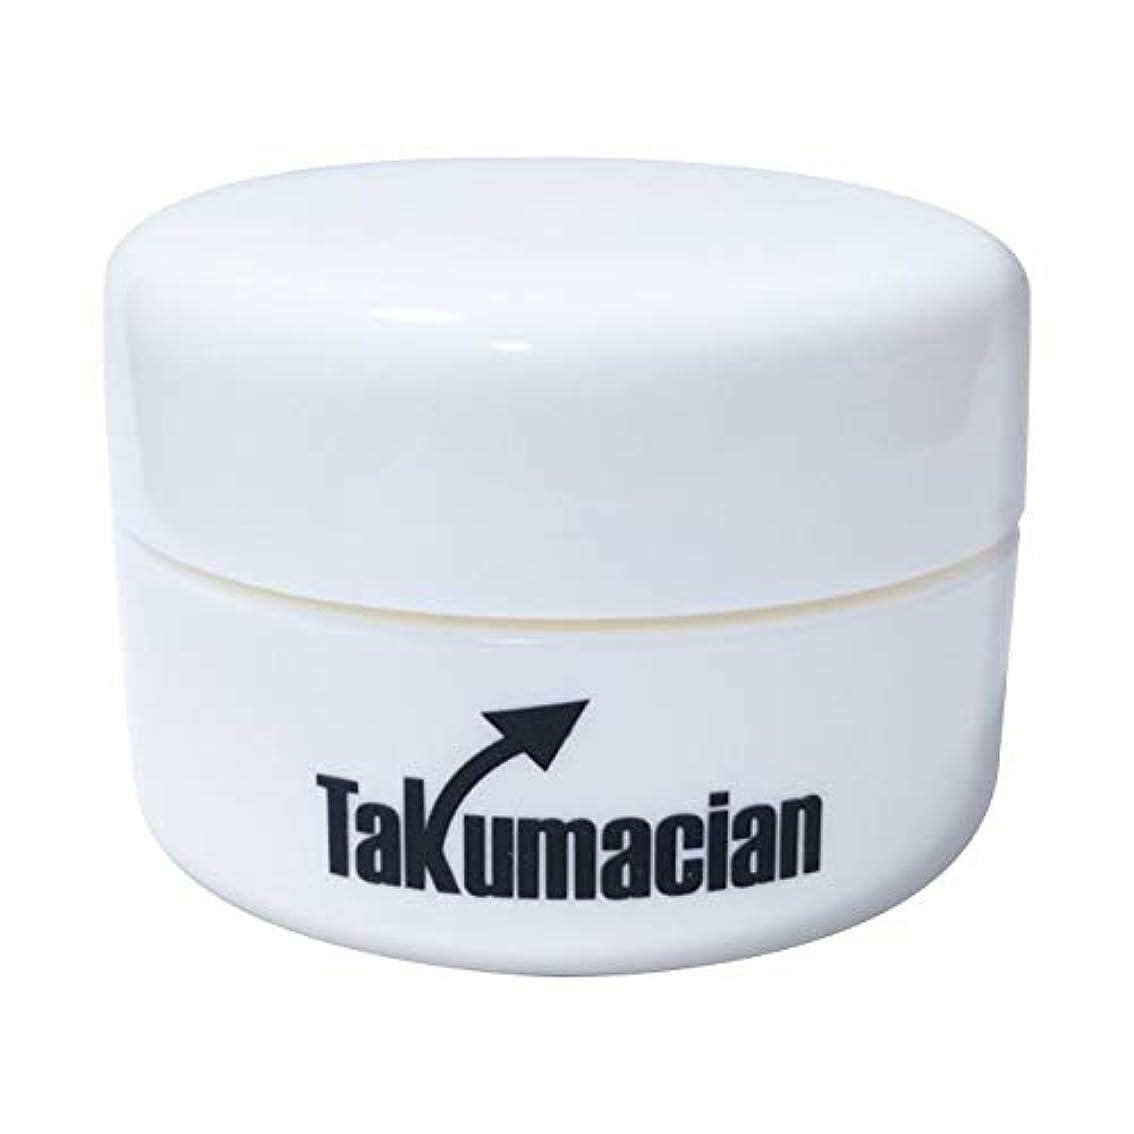 Takumacian タクマシアン ボディ用クリーム 男性用 長持ち 自信